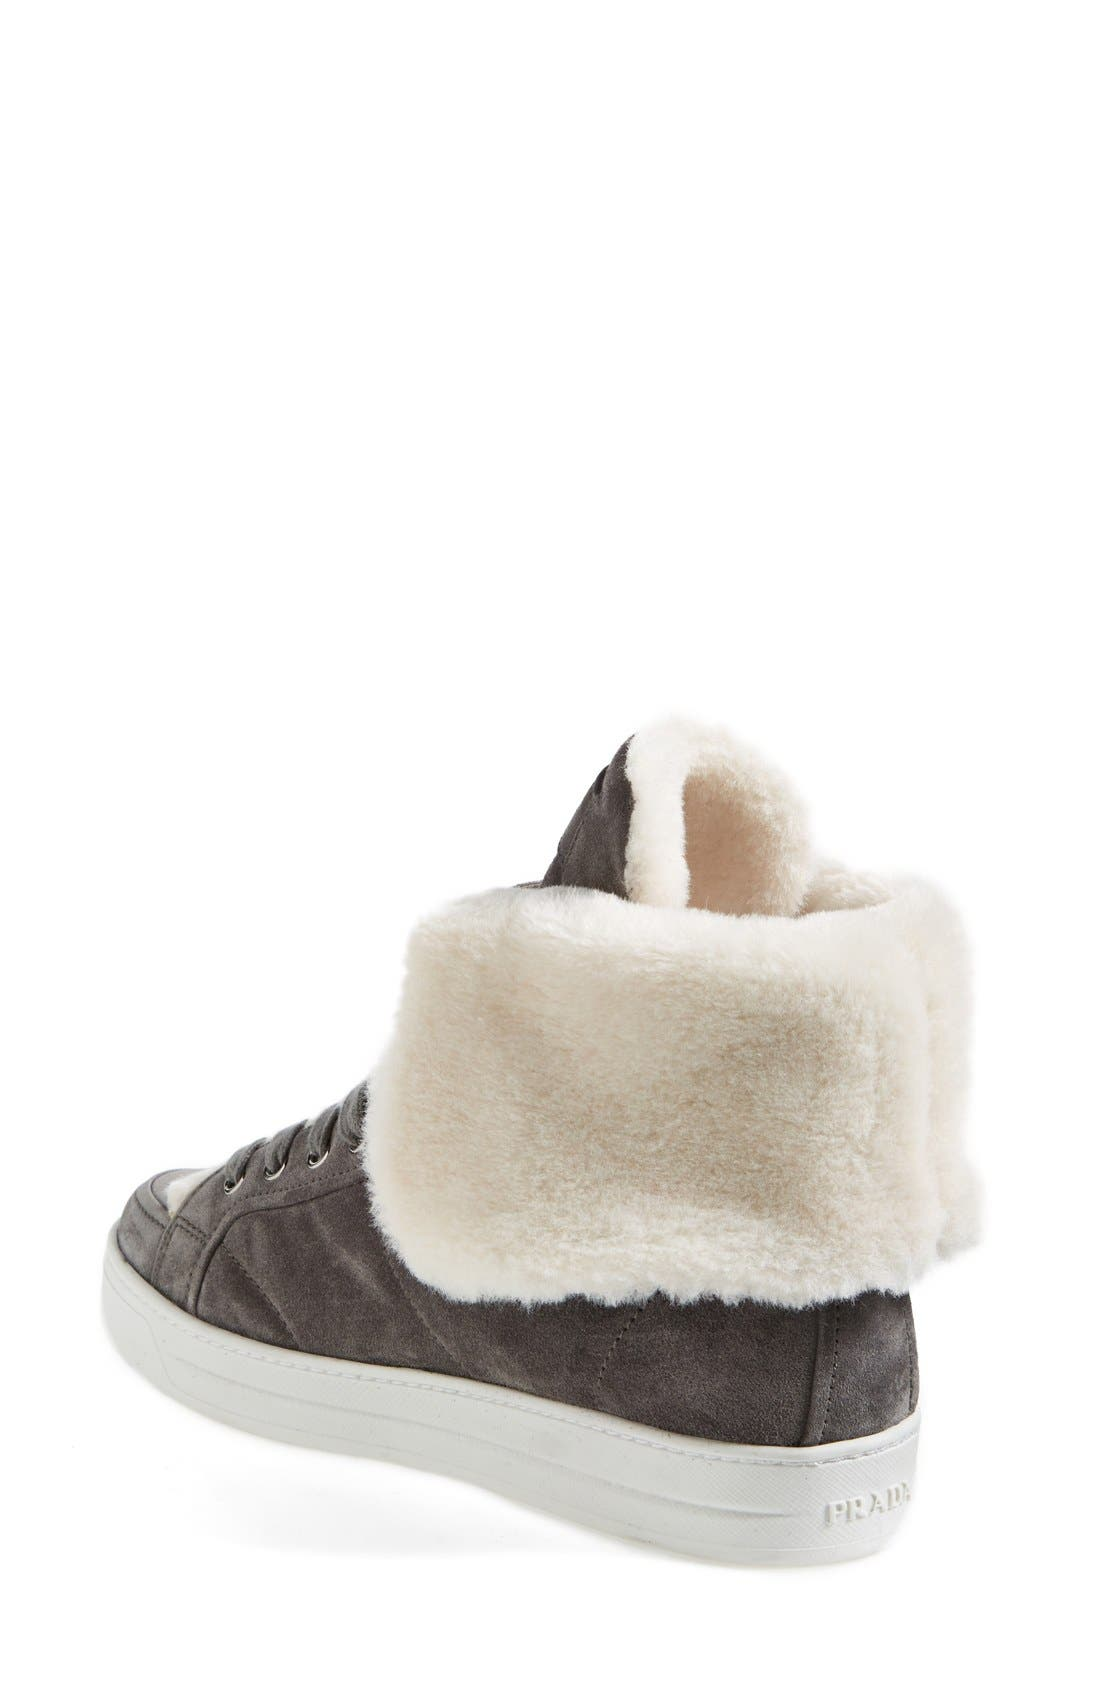 Alternate Image 2  - Prada Faux Shearling Sneaker (Women)